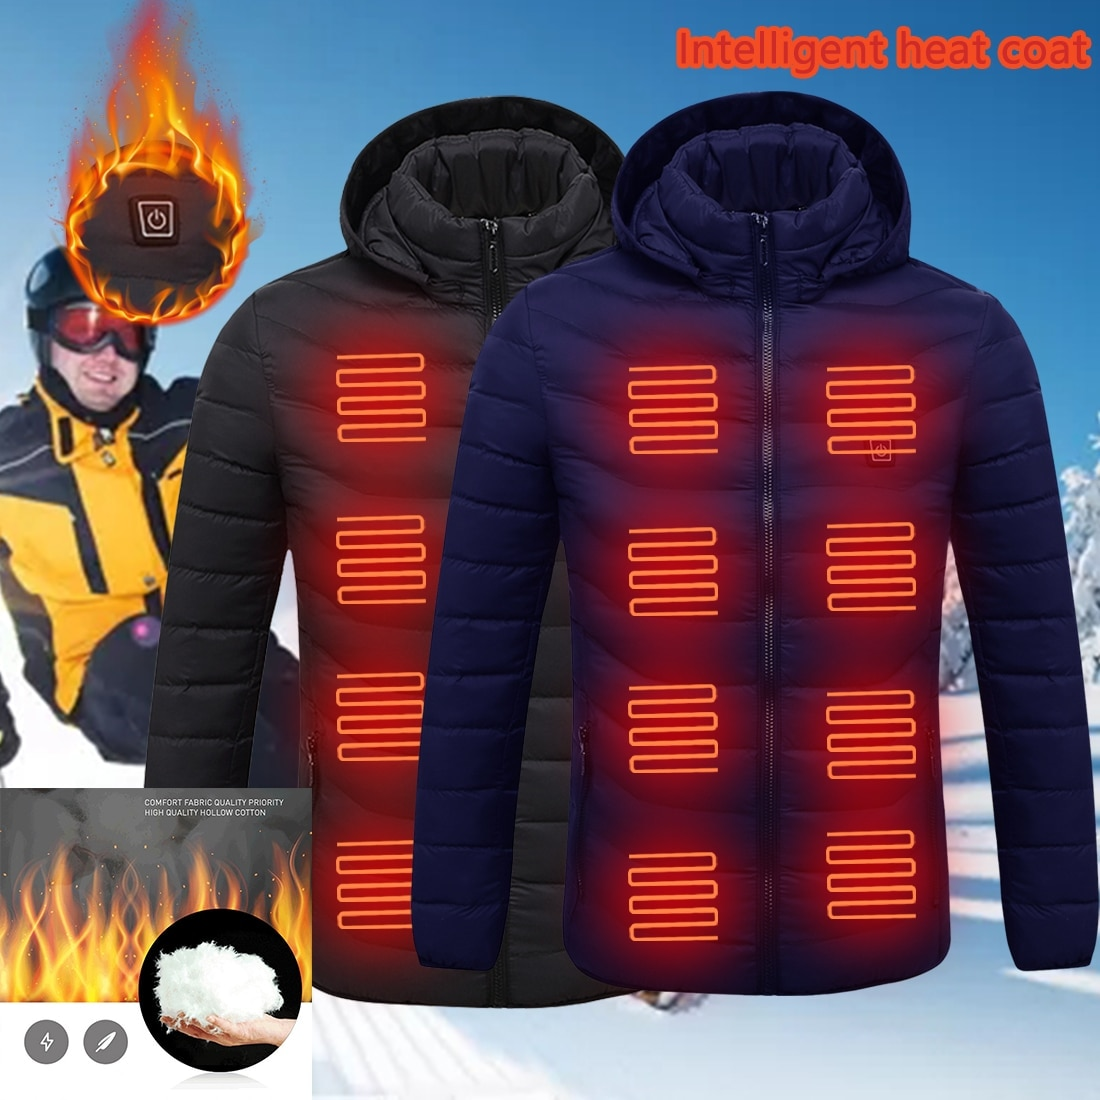 Mens Heated Outdoor Parka Coat USB Electric Battery Heating Hooded Jackets Warm...